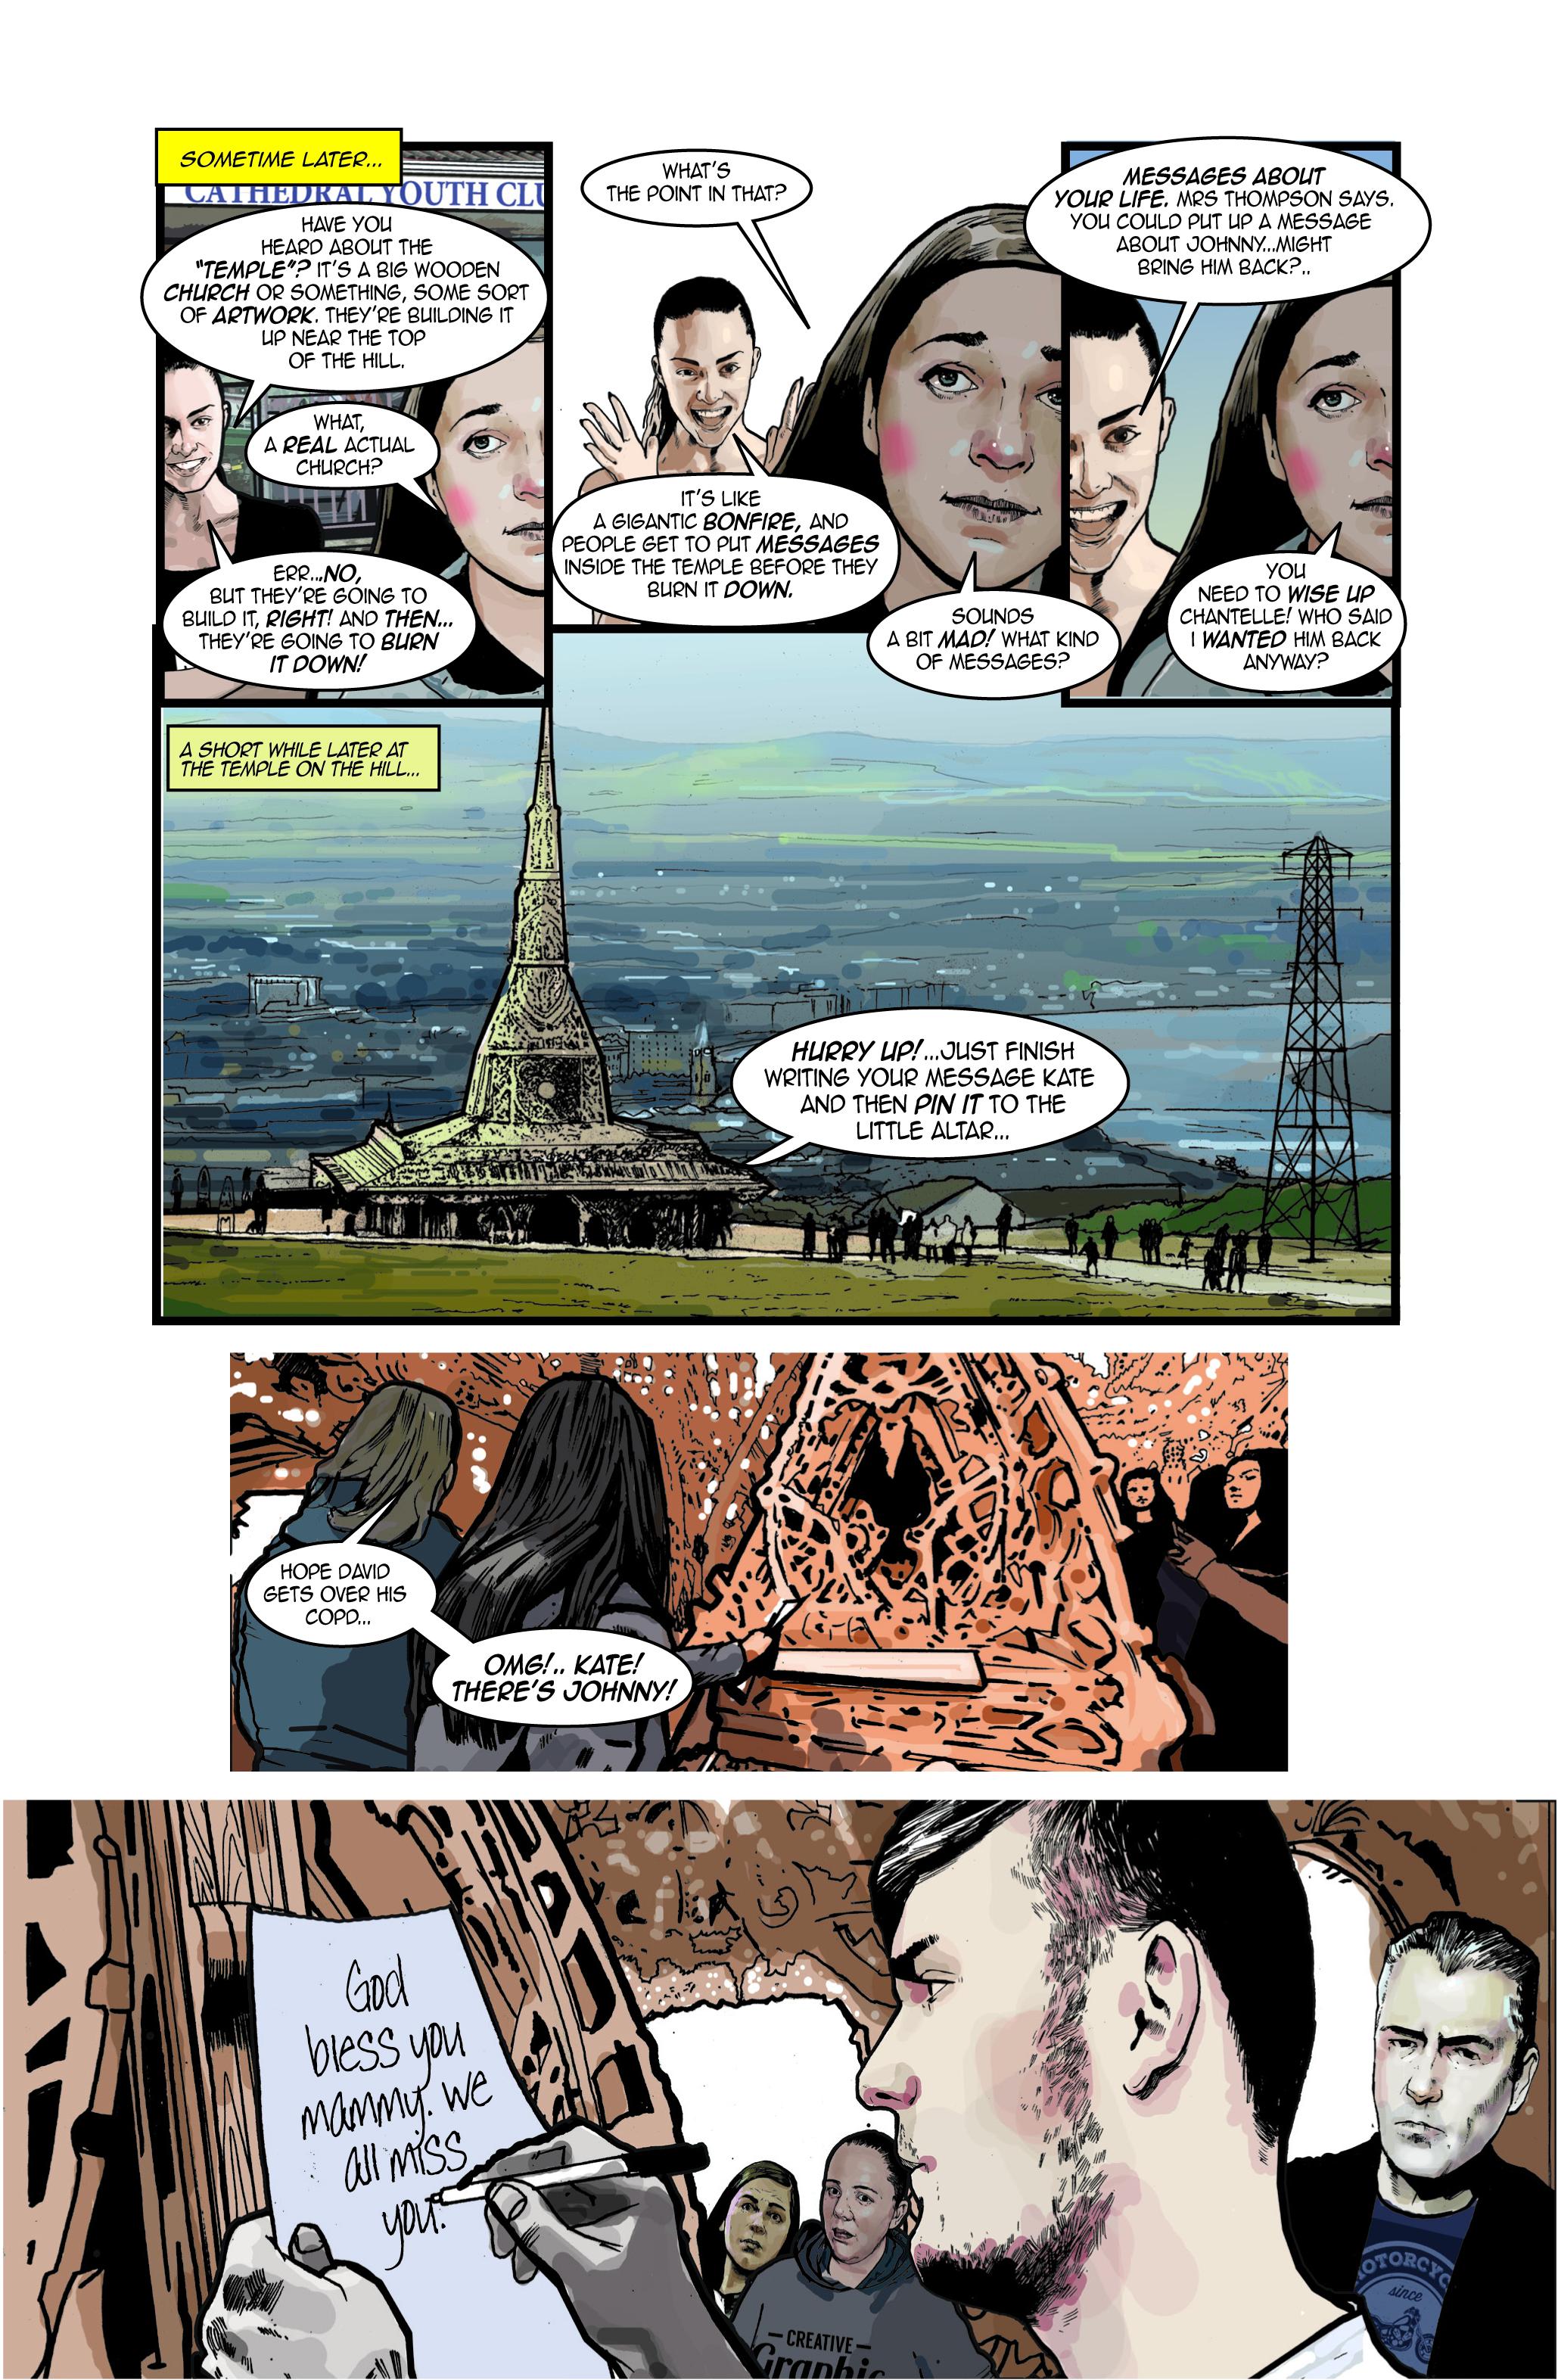 BURNING PAGE 15